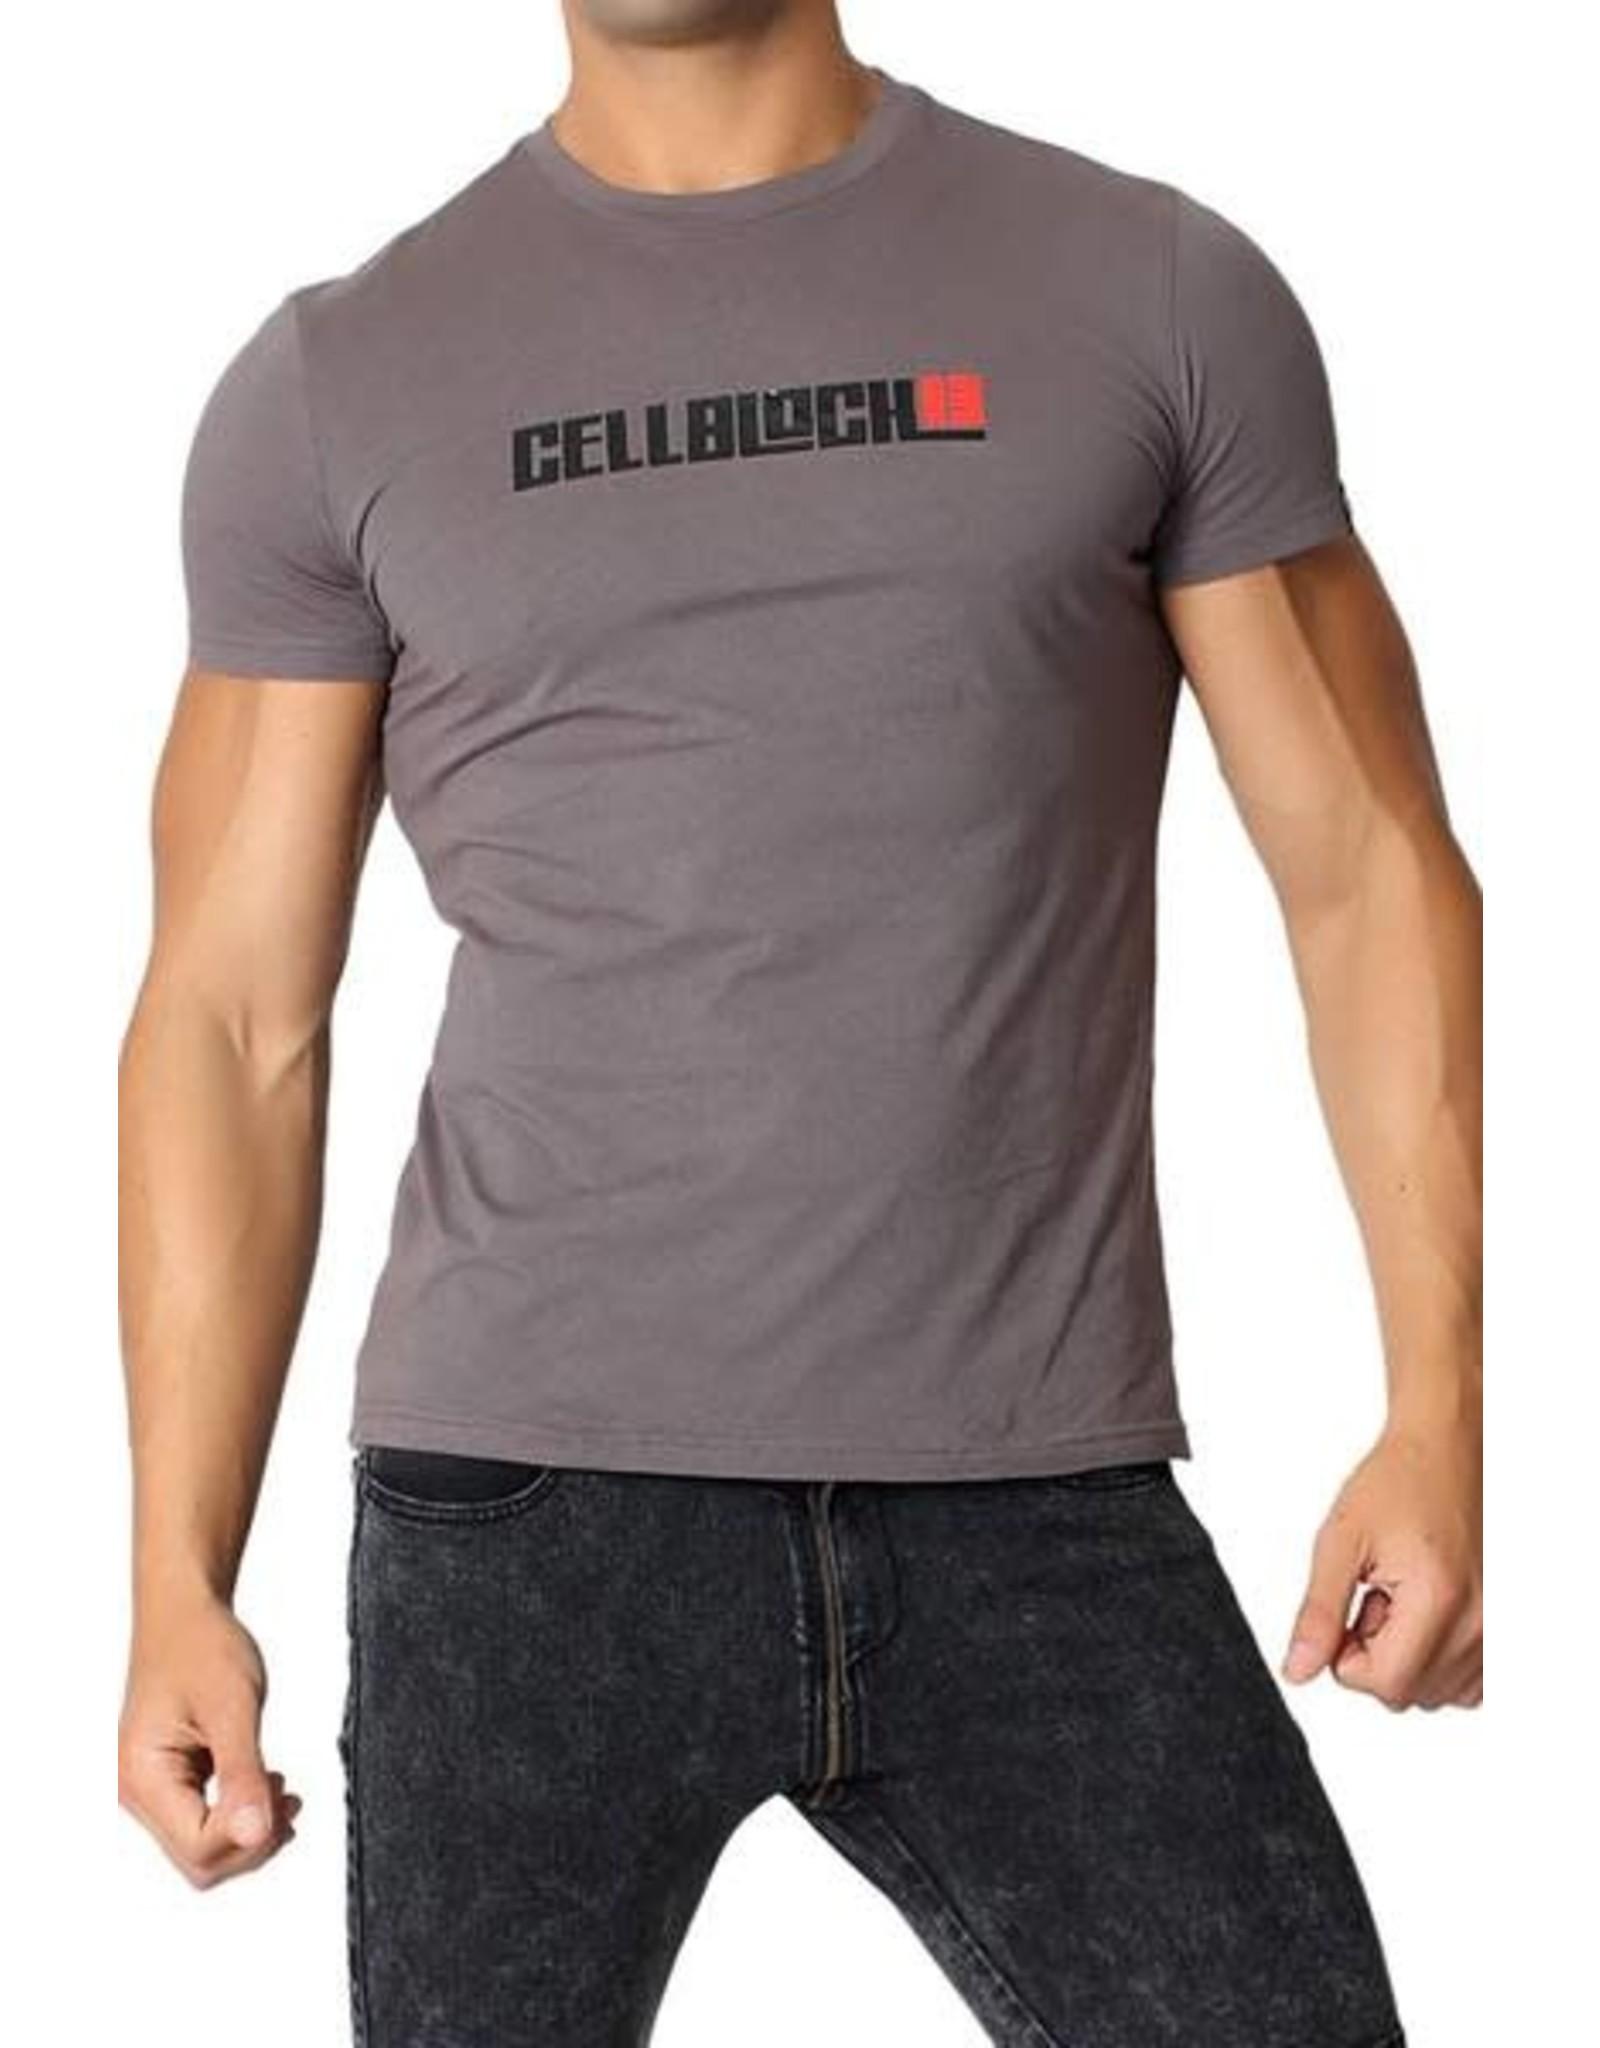 Cellblock13 Cellblock13 CB13 Original Logo Tee